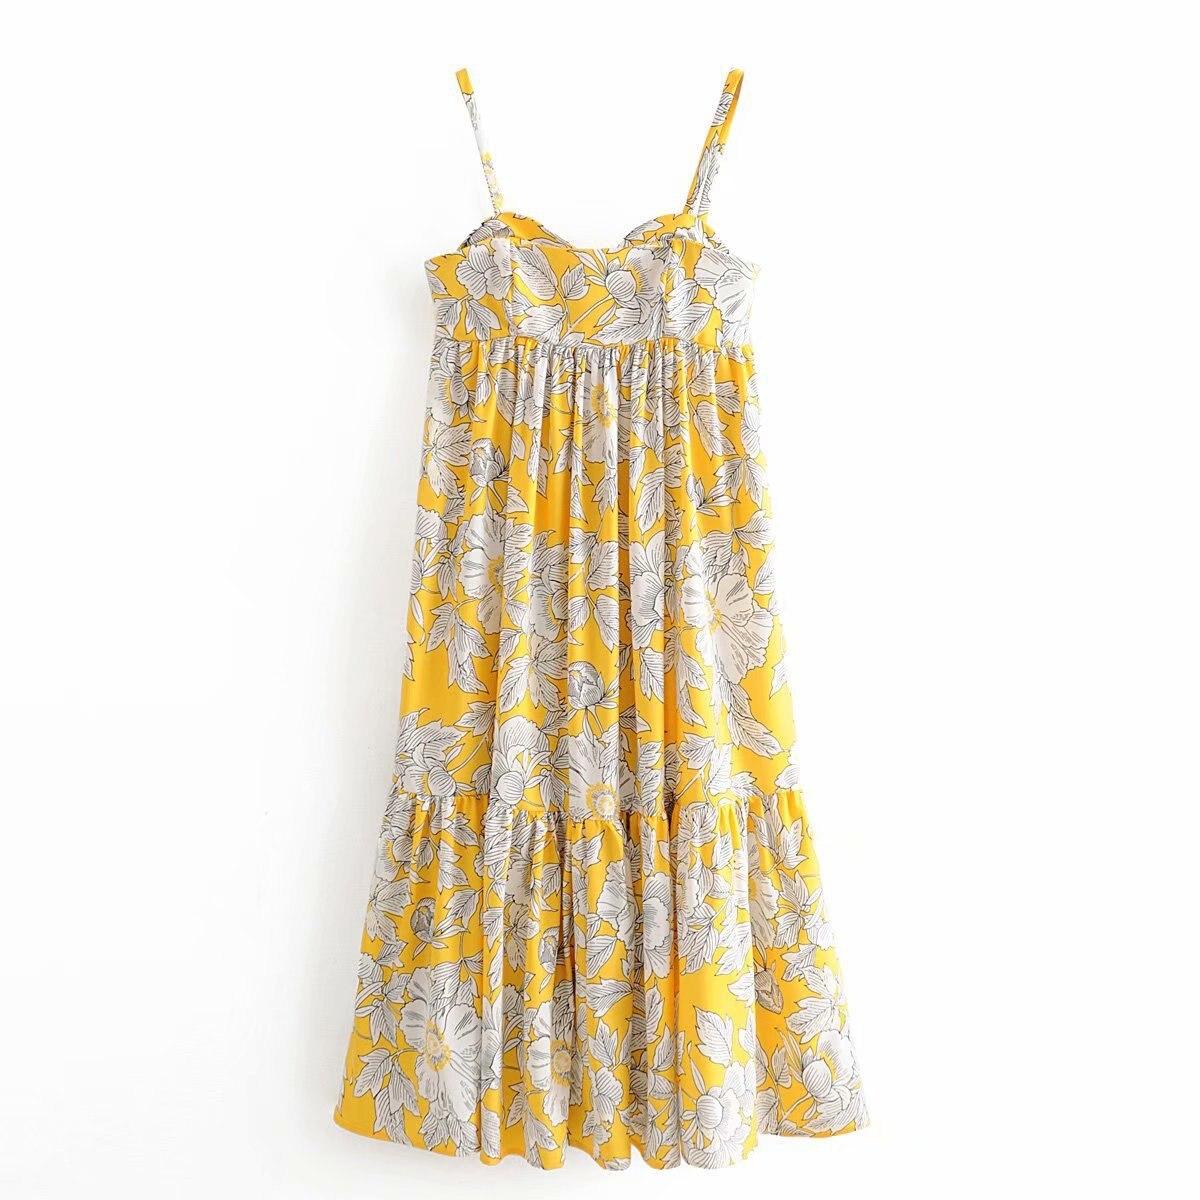 2020 Women's Yellow Printed Poplin Suspender Dress Women Sexy Spaghetti Strap Club Dresses Summer clothes Vestidos